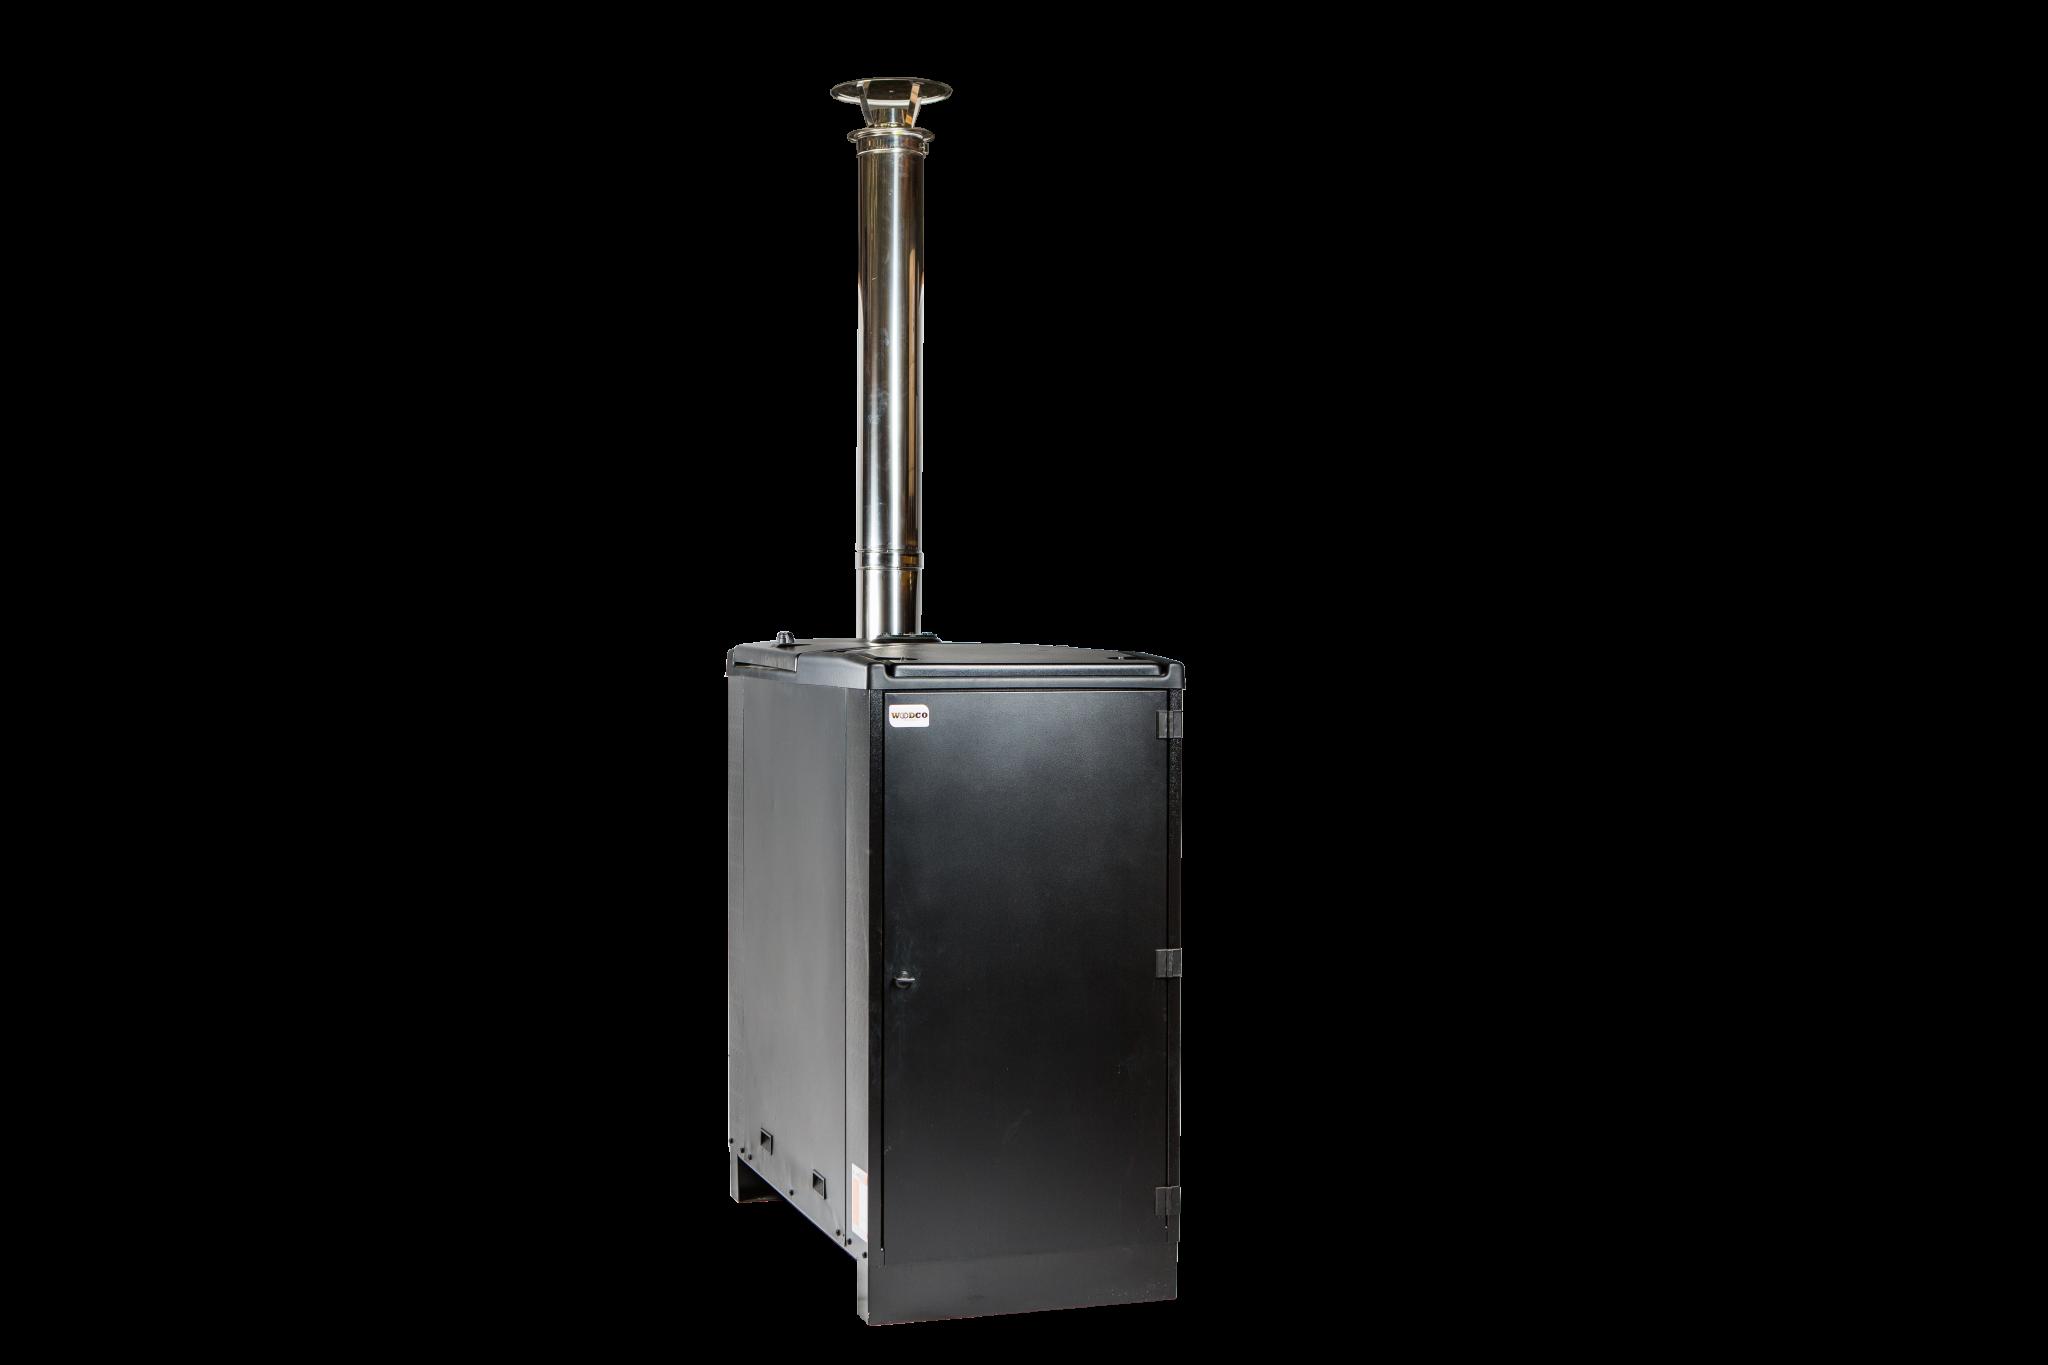 Outdoor Pellet Boiler | Outdoor Pellet Boilers Ireland